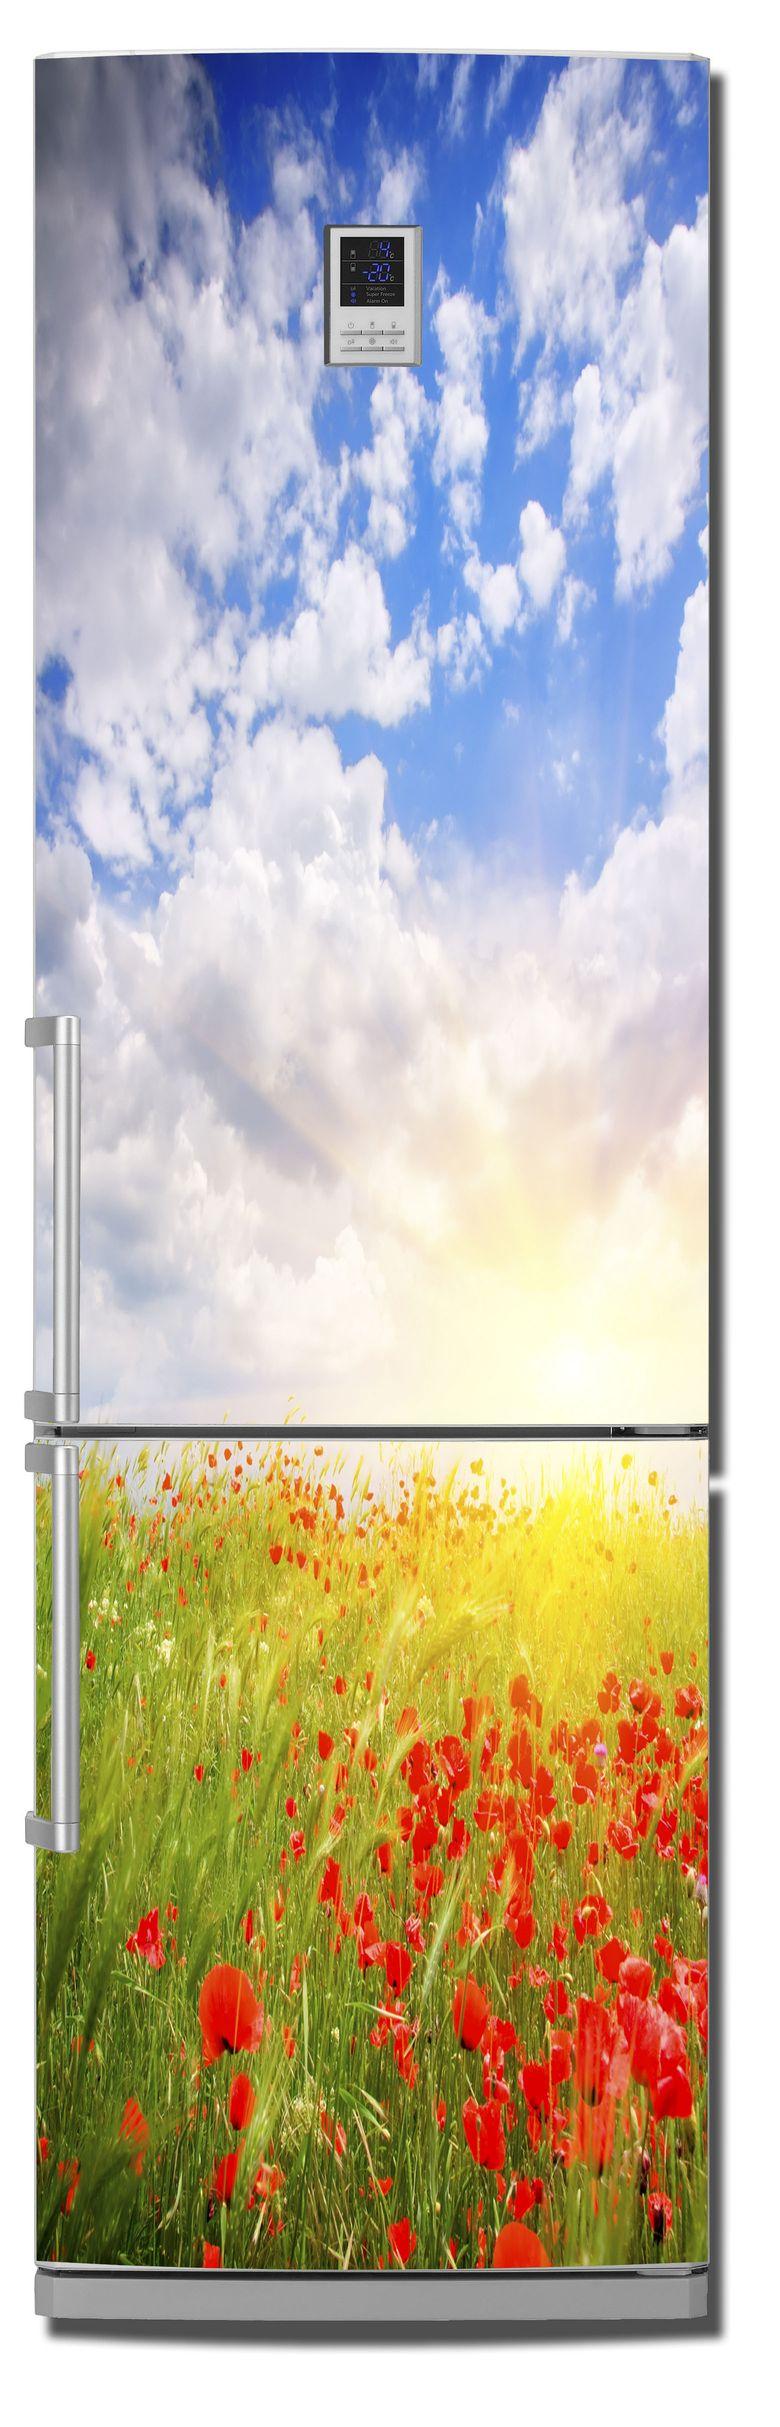 Наклейка на холодильник  - маки